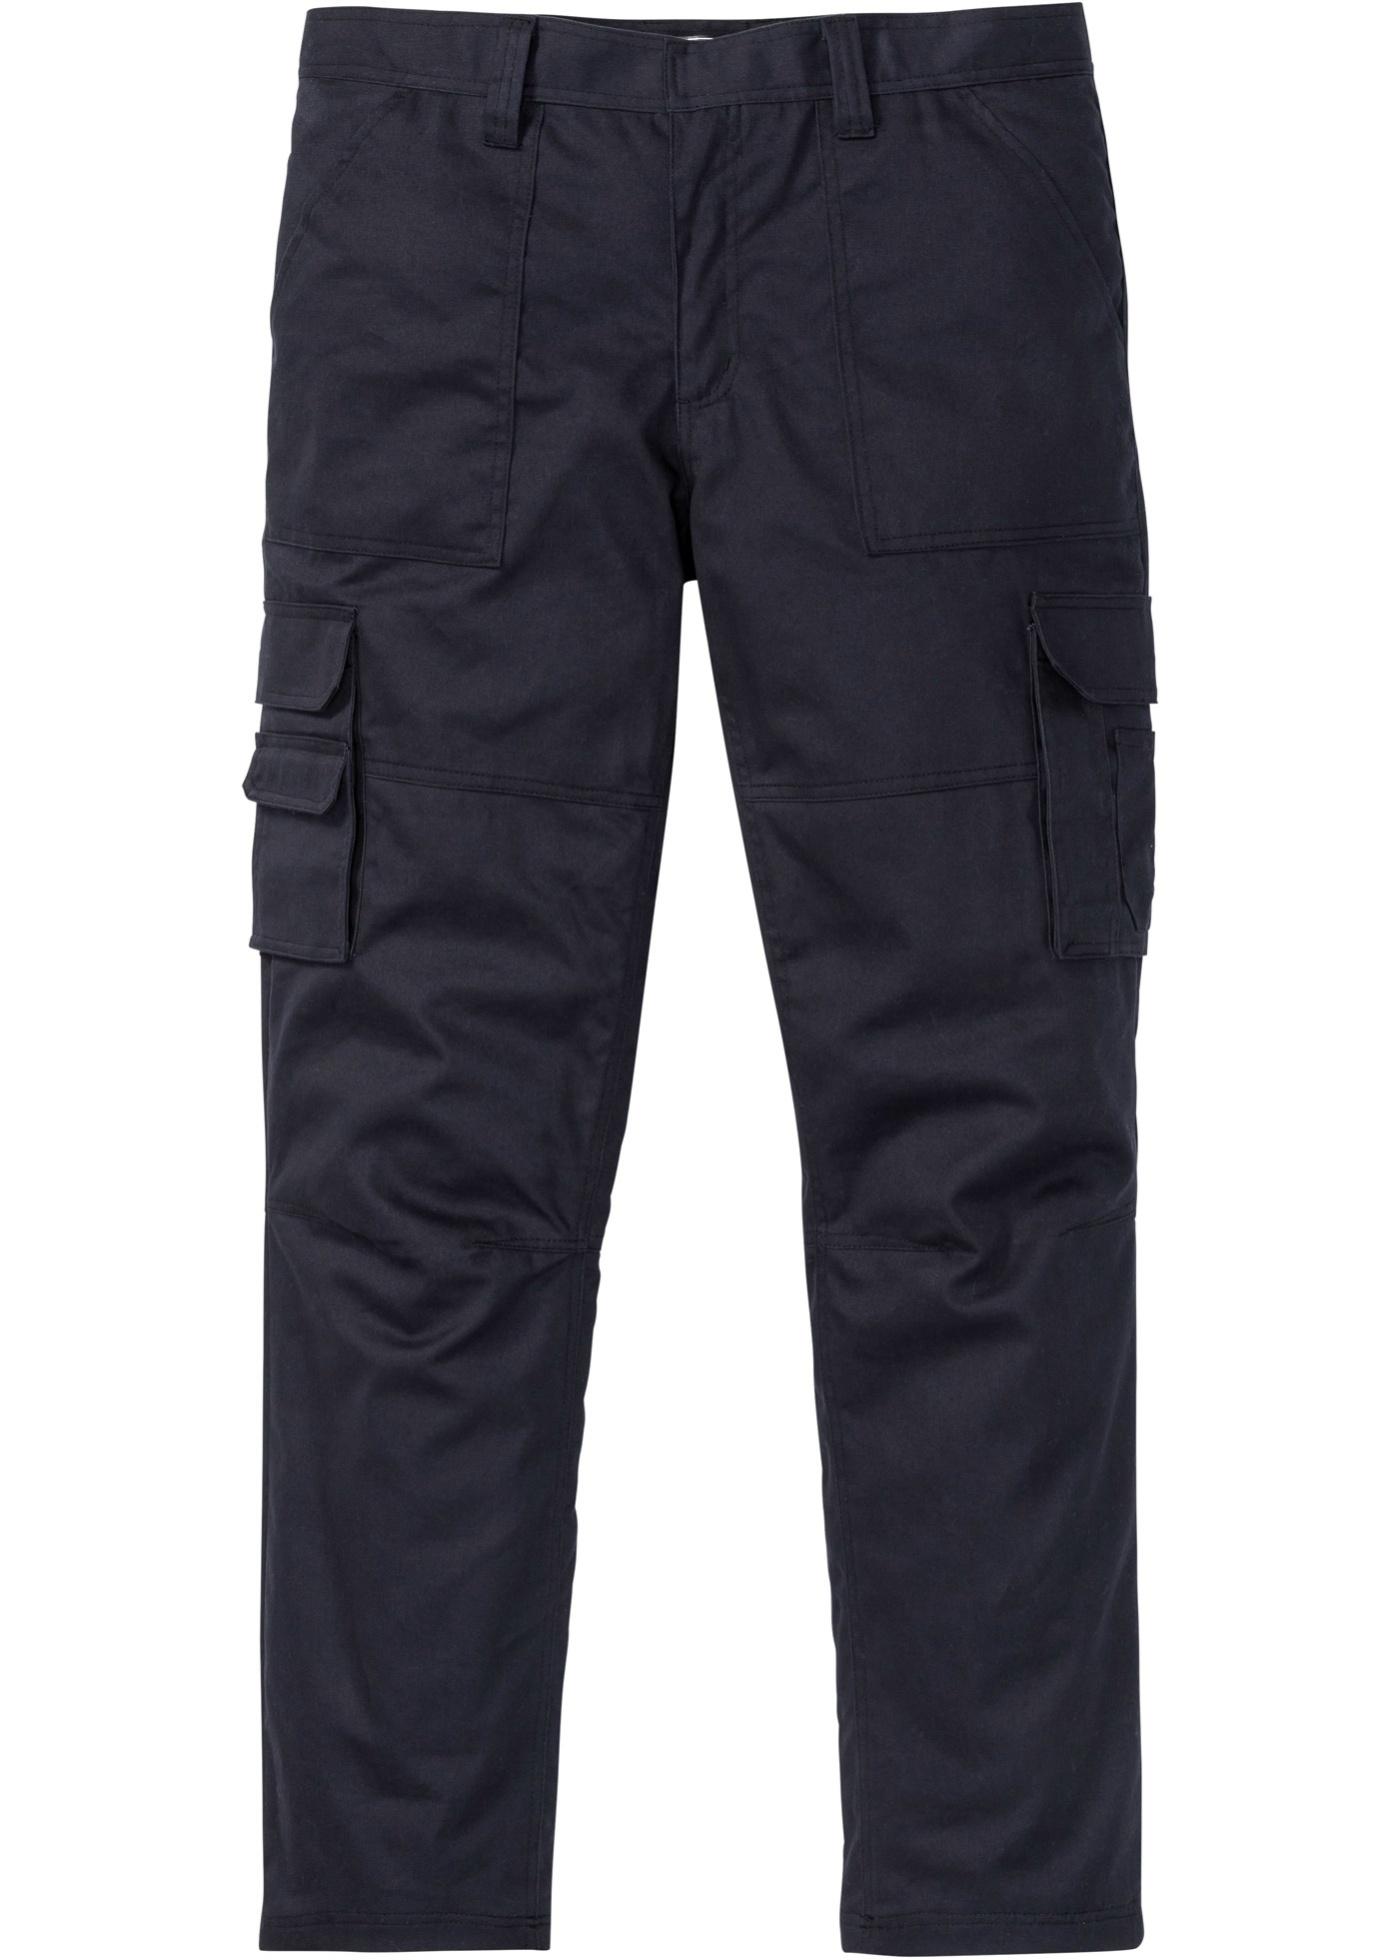 Herren bonprix Thermo-Cargo-Hose m. Teflonausrüstung Loose fit blau, grau   06937251326570